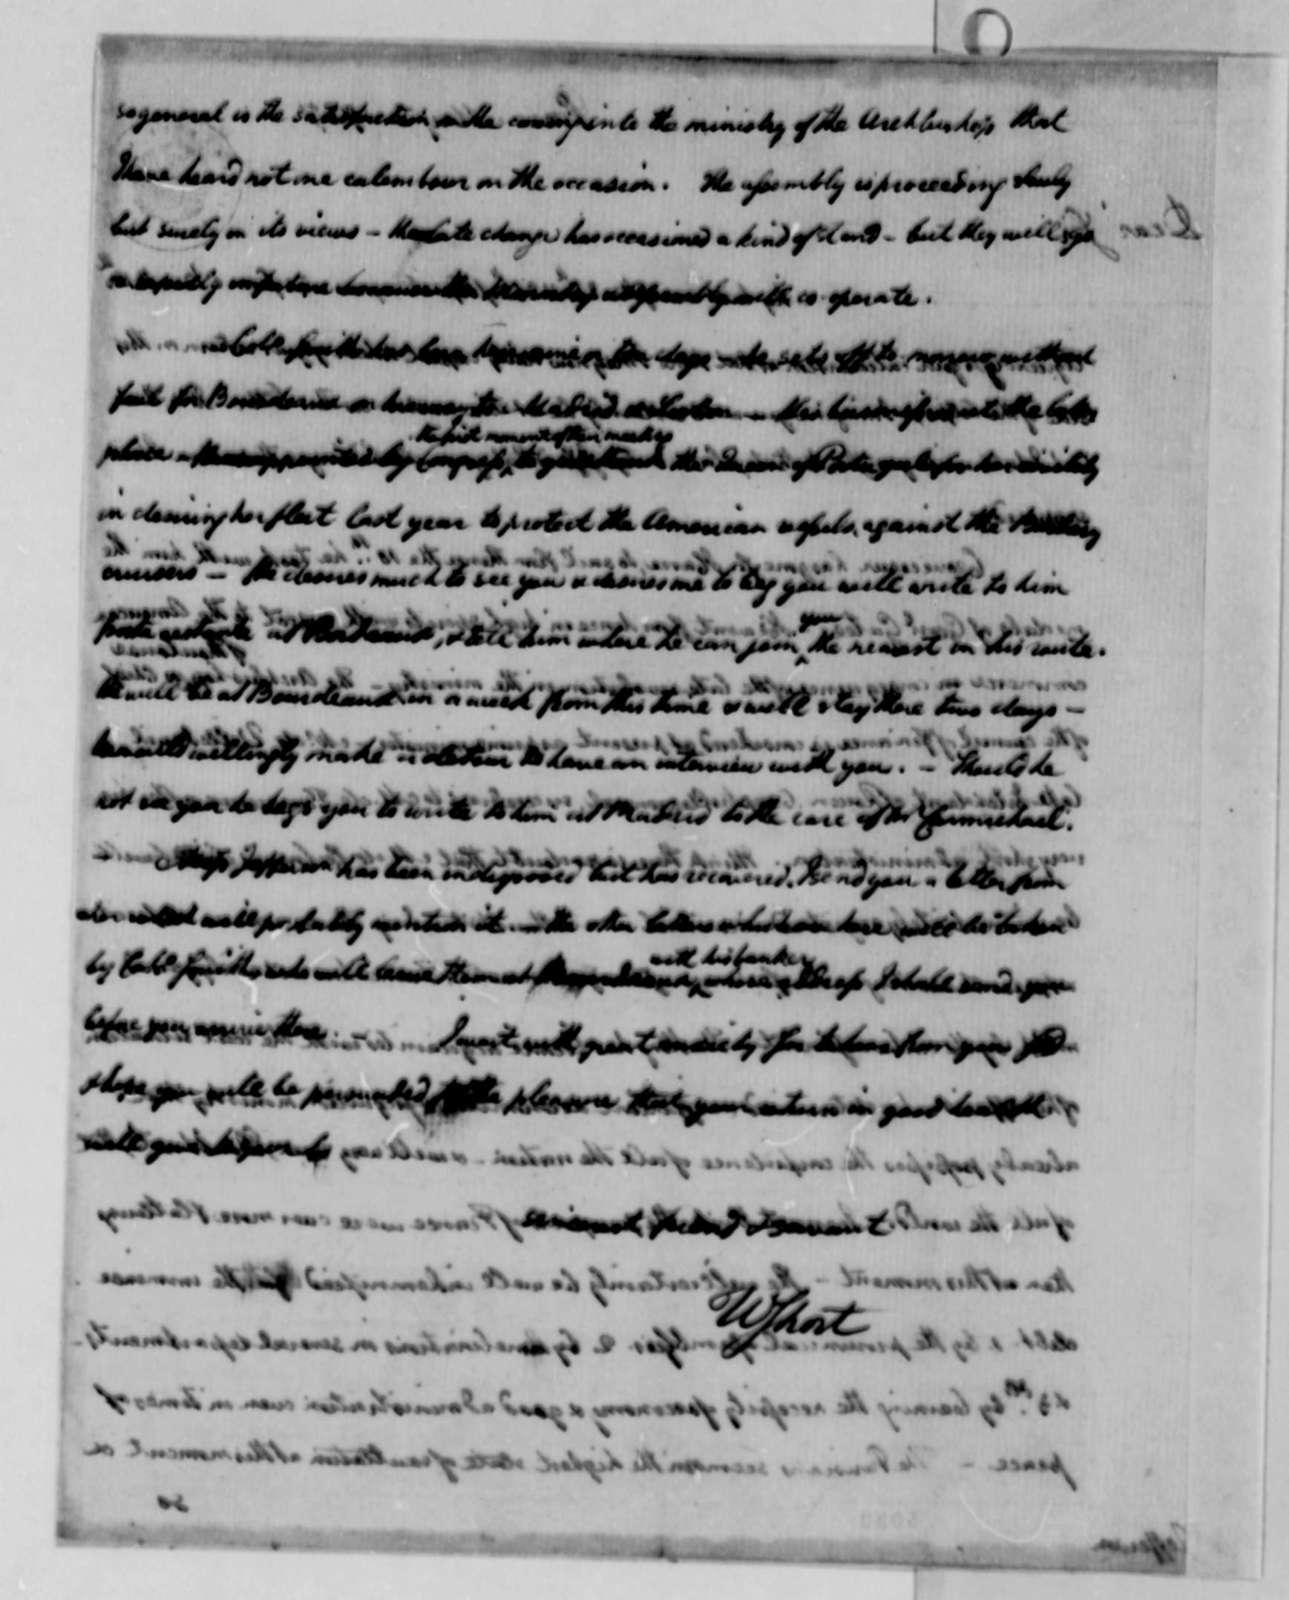 William Short to Thomas Jefferson, May 8, 1787